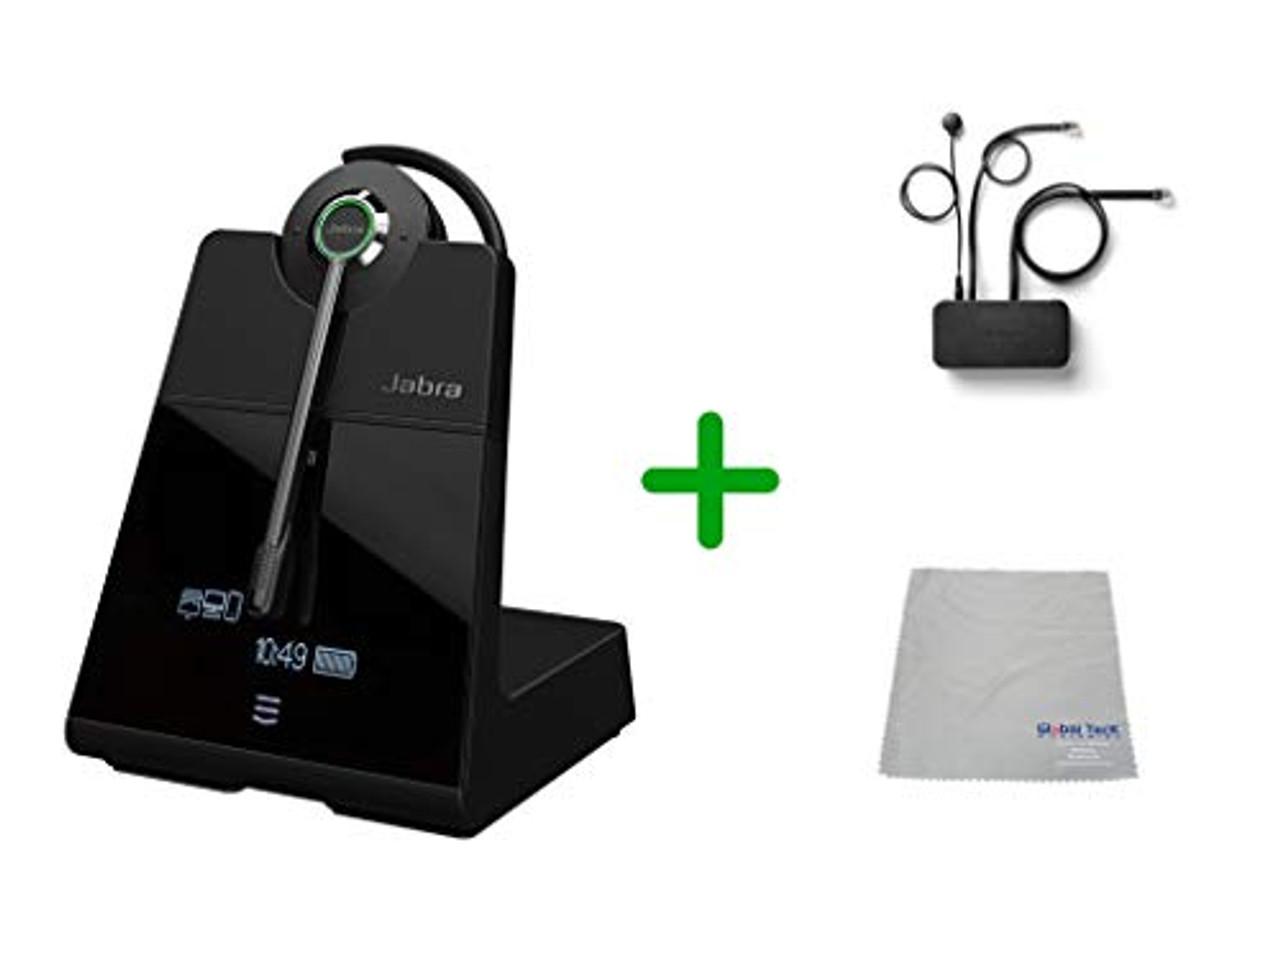 Avaya Compatible Jabra Engage 75 Wireless Headset Bundle With Ehs Adapter 9555 583 125 Ava35 Avaya Deskphones Bluetooth Phones Pc Mac Compatible Models J169 J179 1608 1616 1608 1616 9620 9630 9640 9650 9 Hour Battery Global Teck